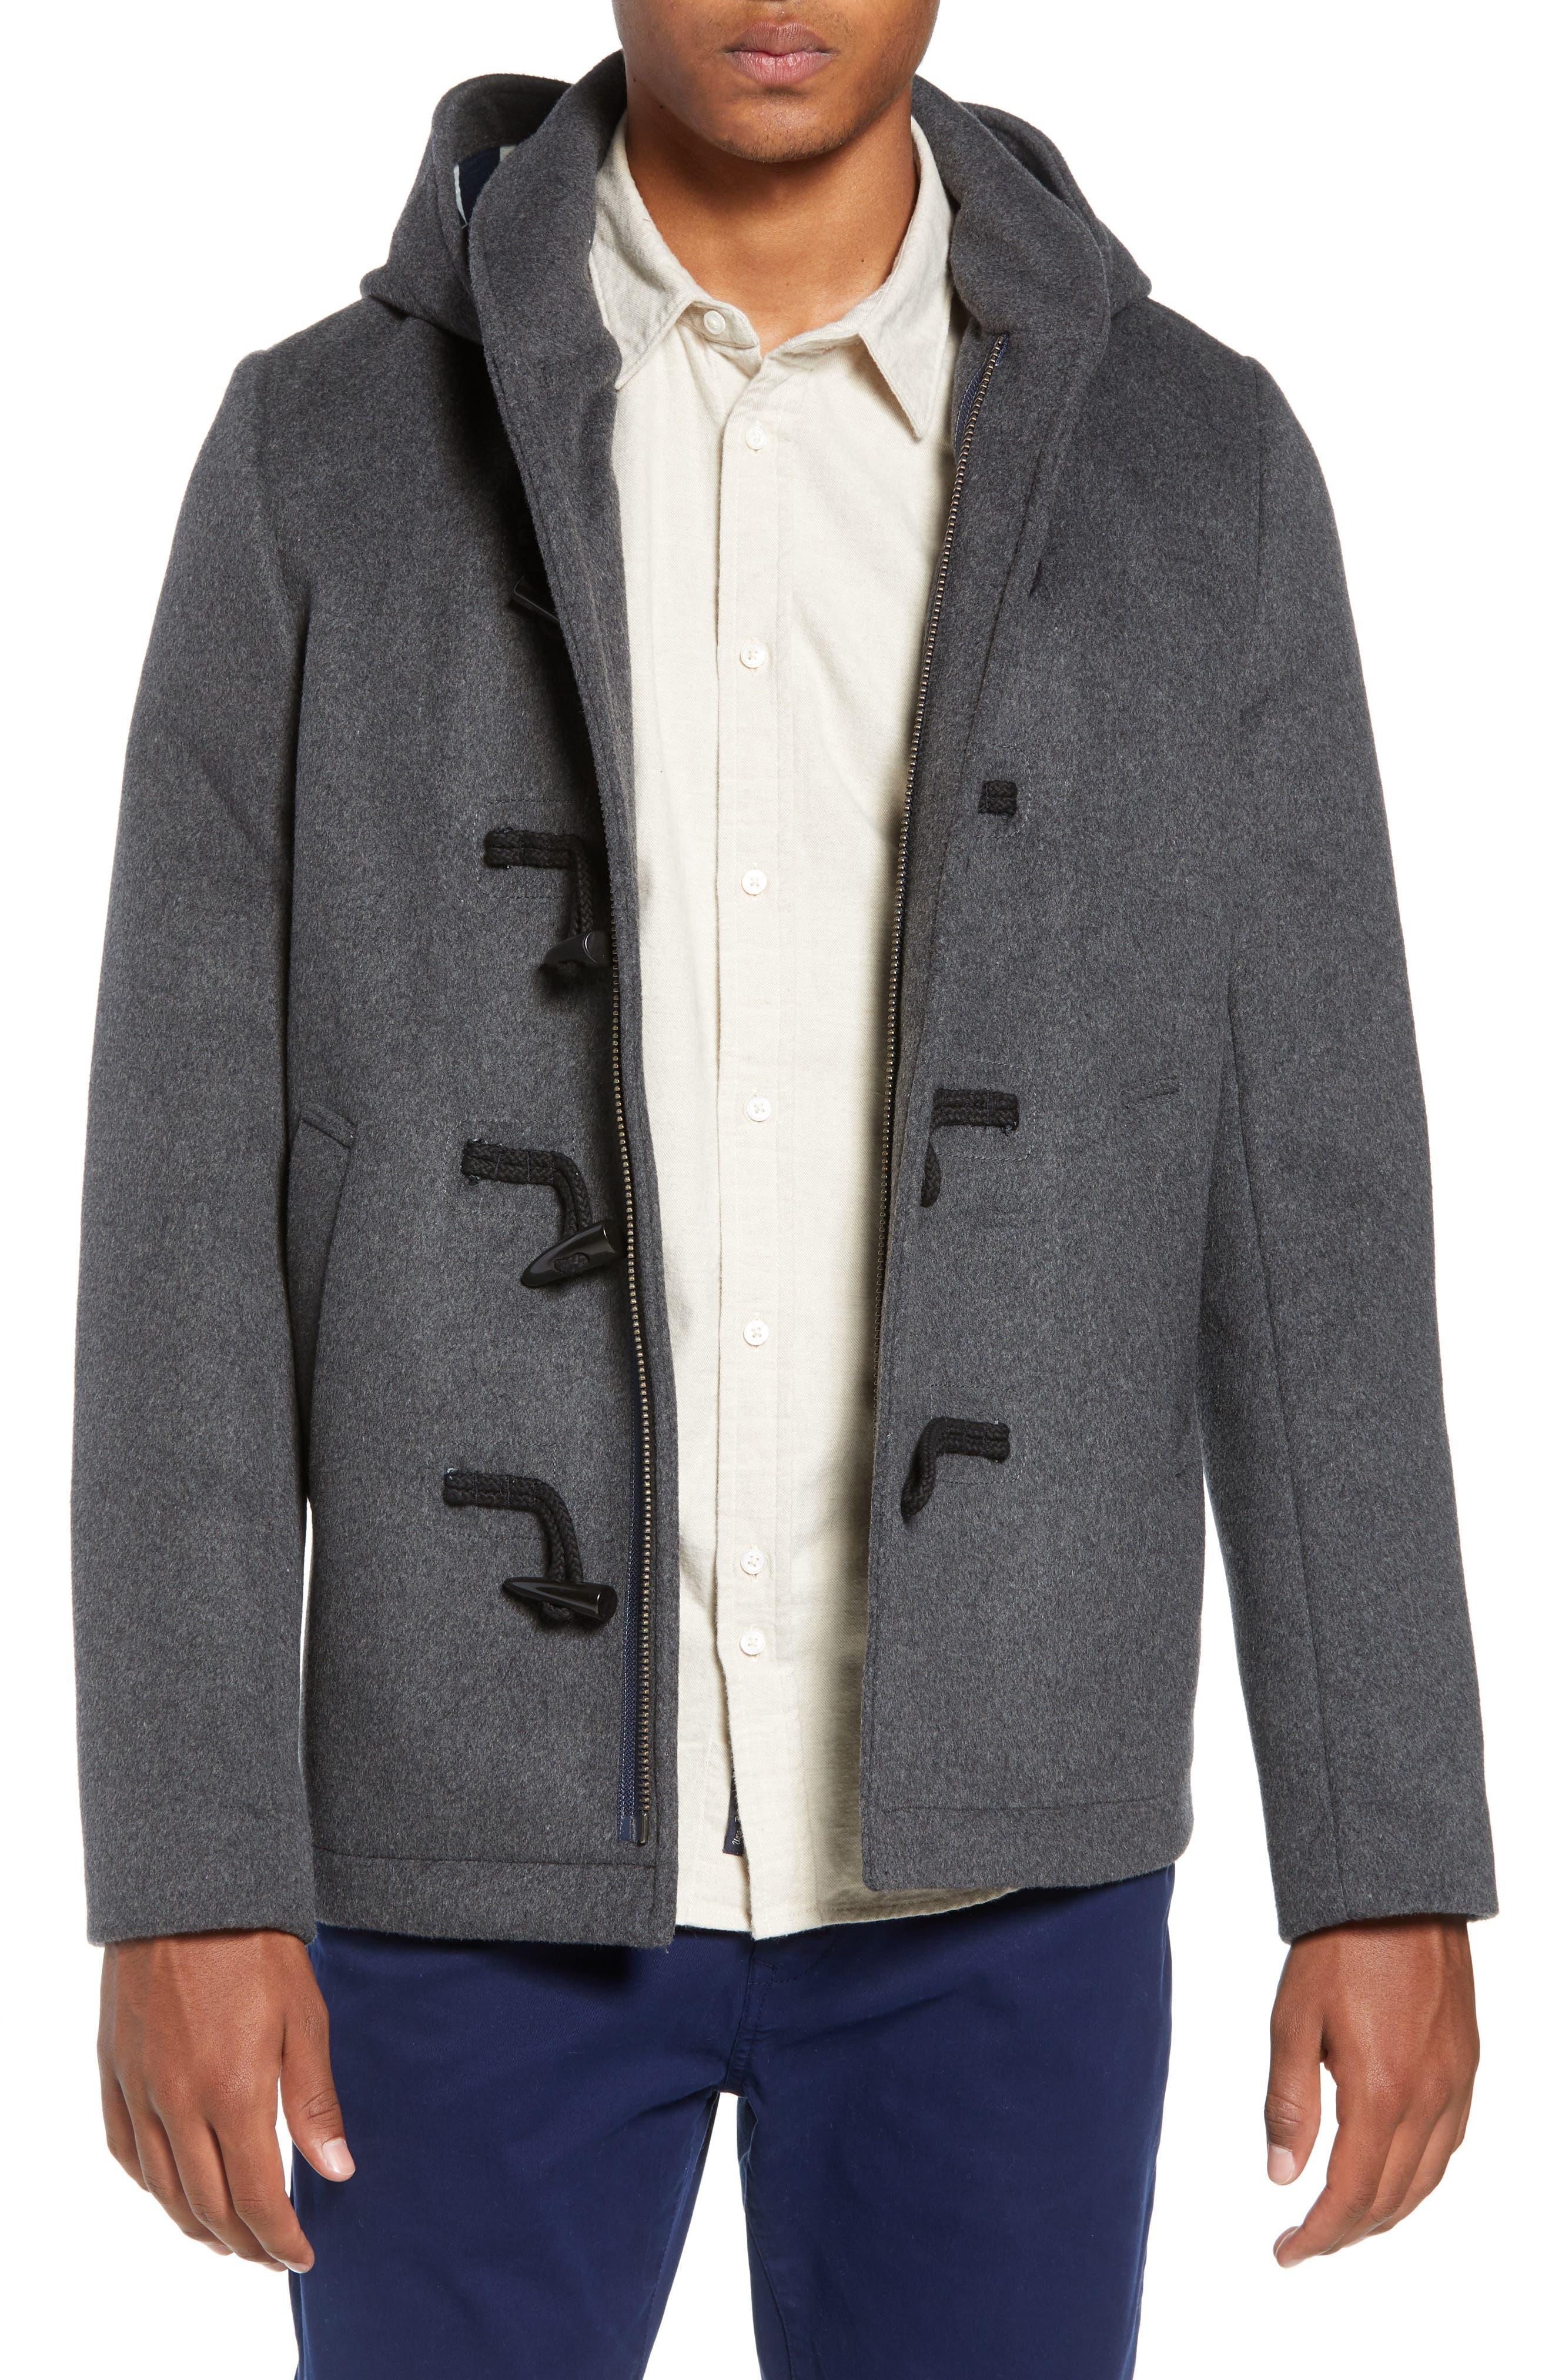 SCOTCH & SODA Wool Blend Duffel Coat, Main, color, 030